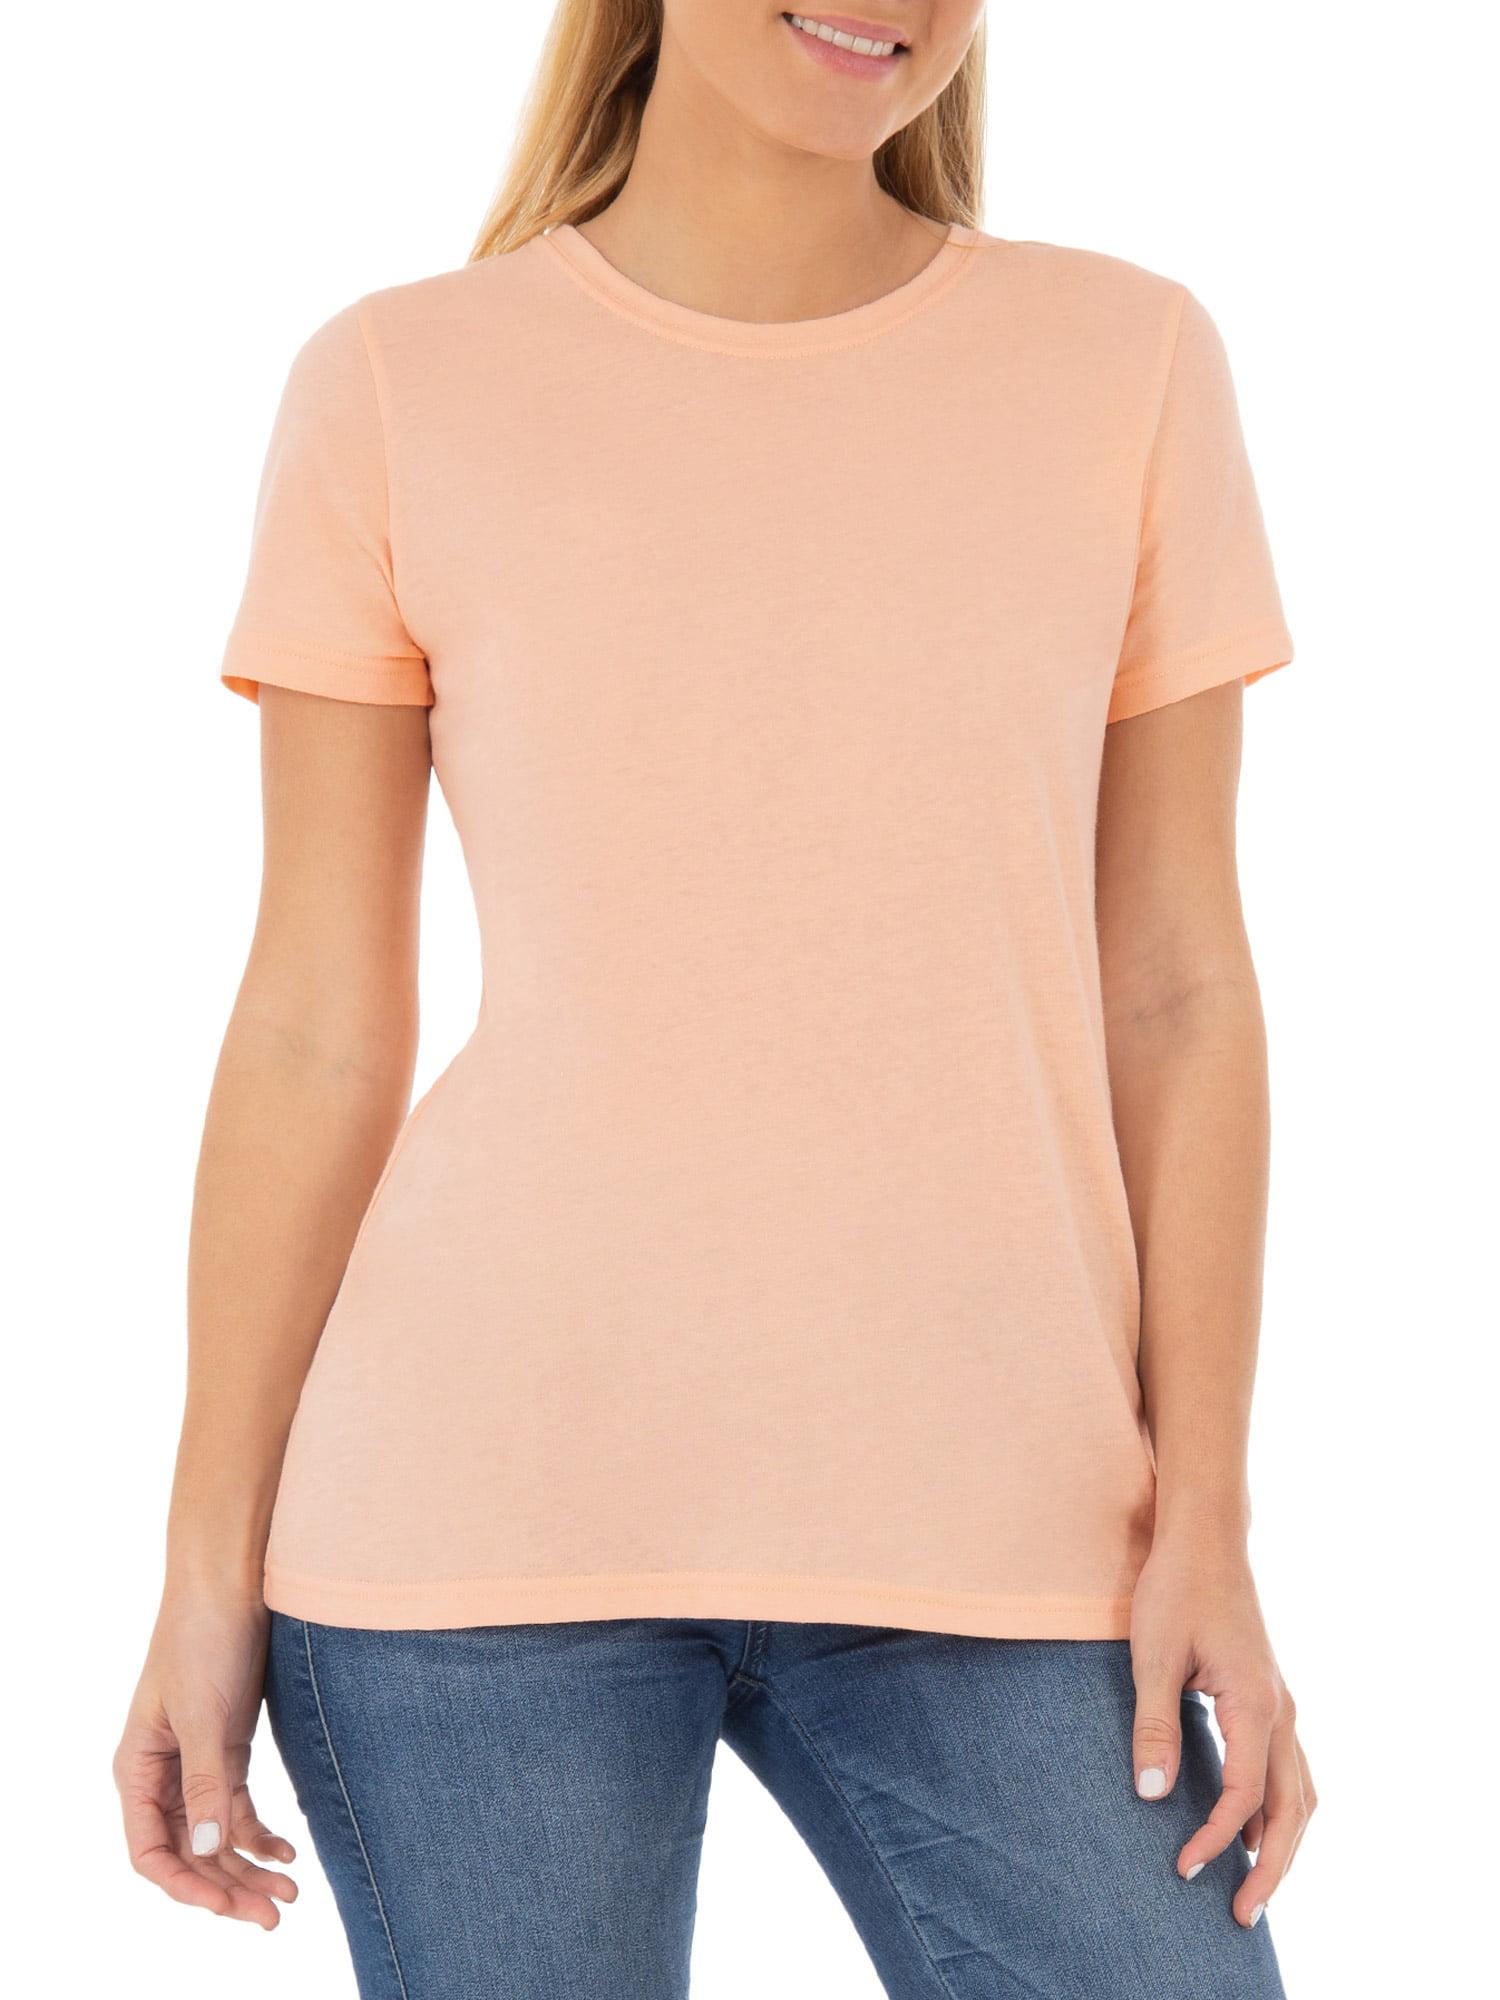 Women's Essential Short Sleeve Crewneck T-Shirt, 2 Pk Bundle